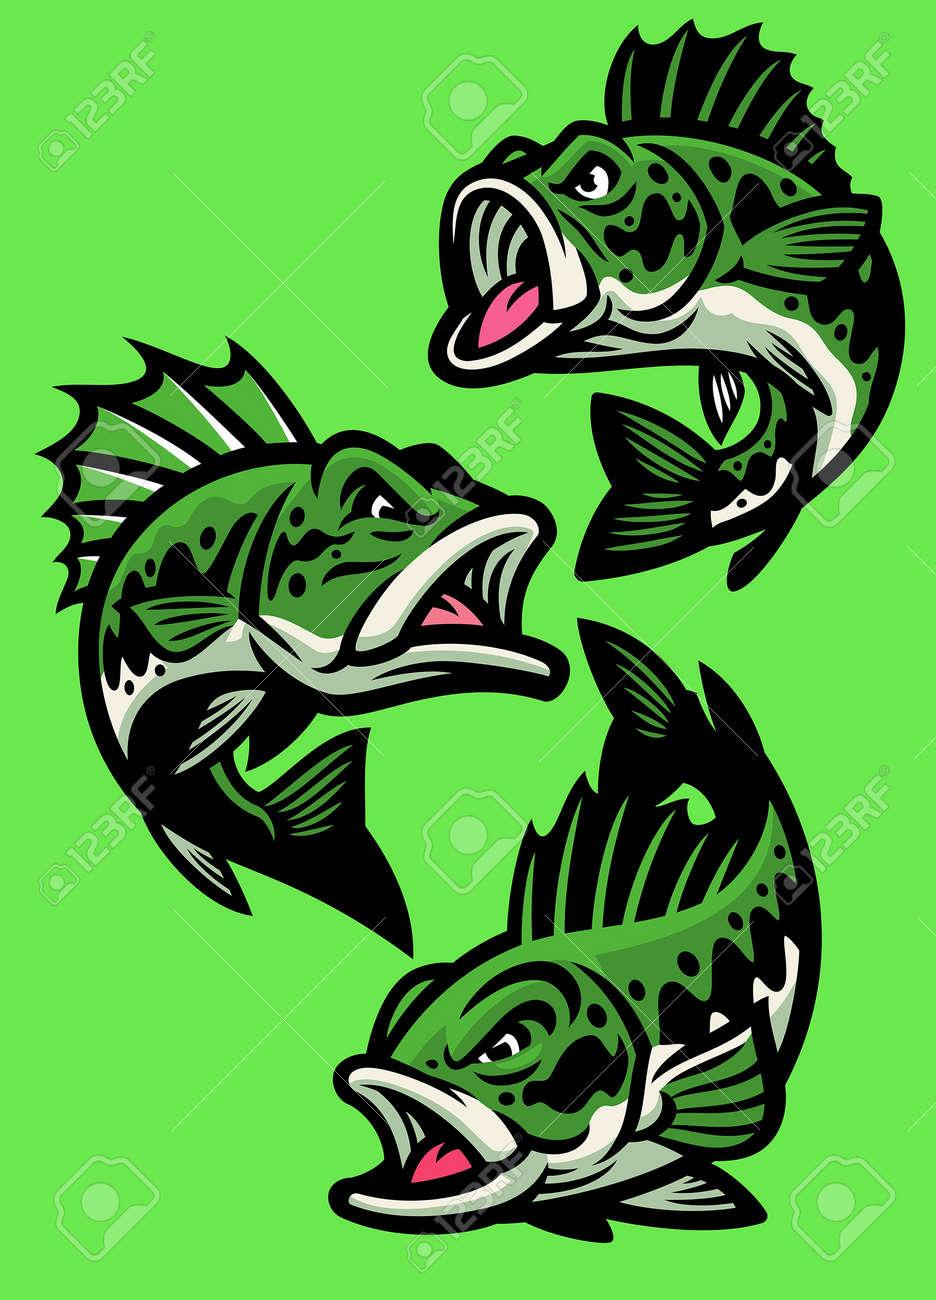 vector set of angry cartoon largemouth bass fish - 169099671